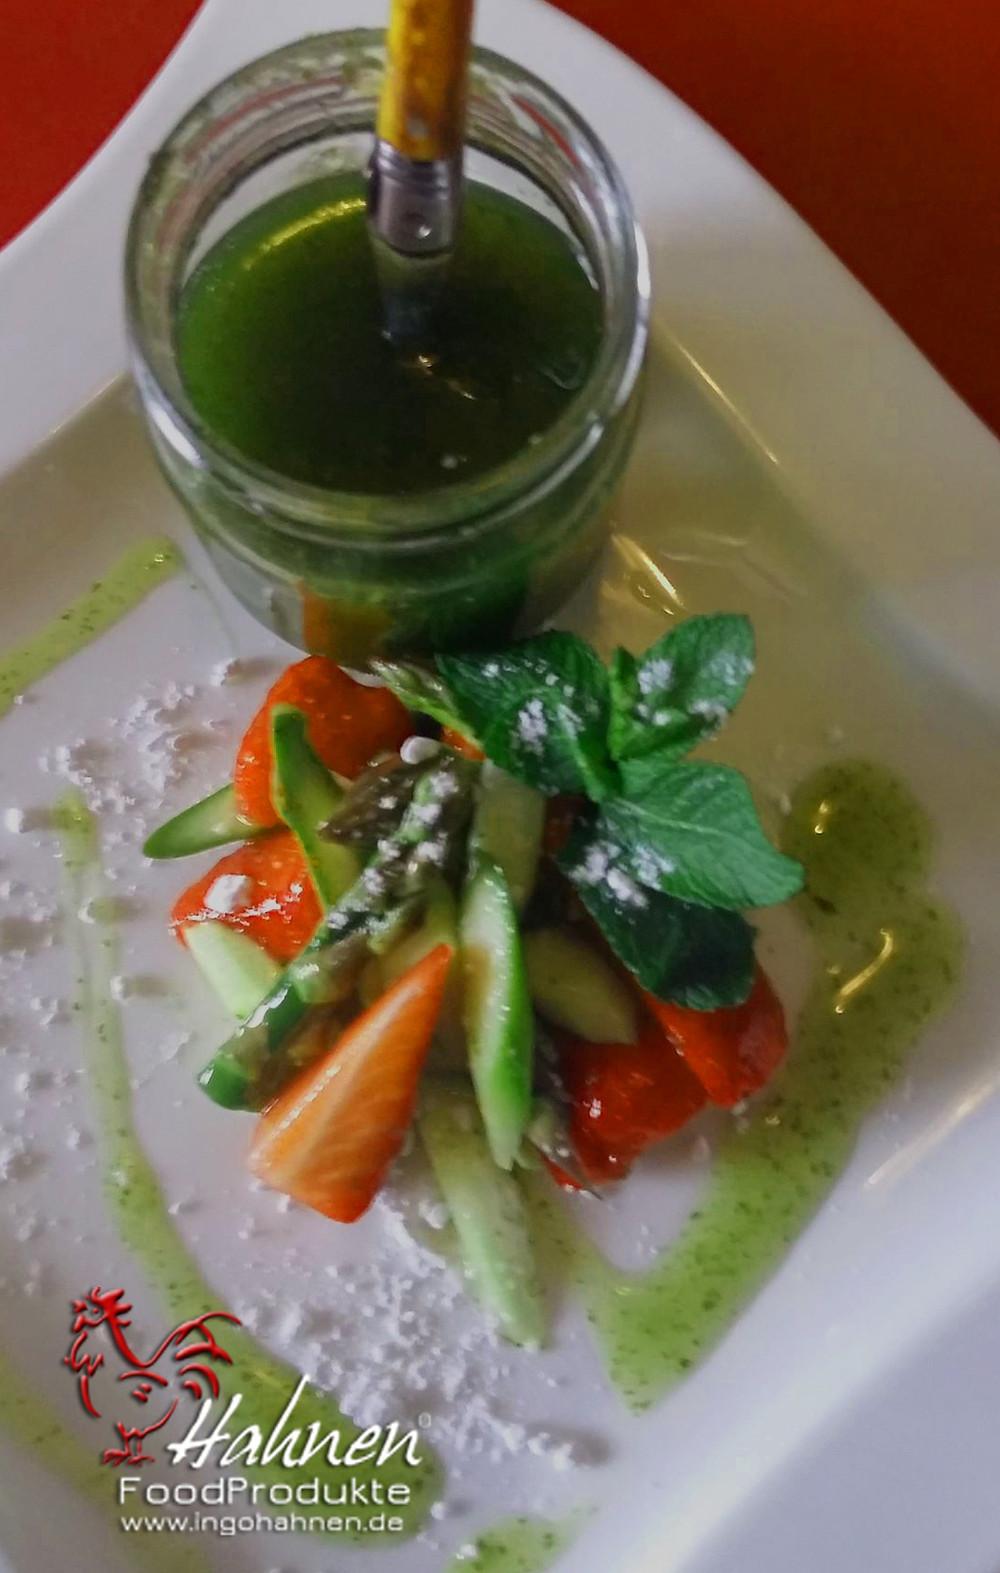 Erdbeer-Spargelsalat mit Süßem Pesto